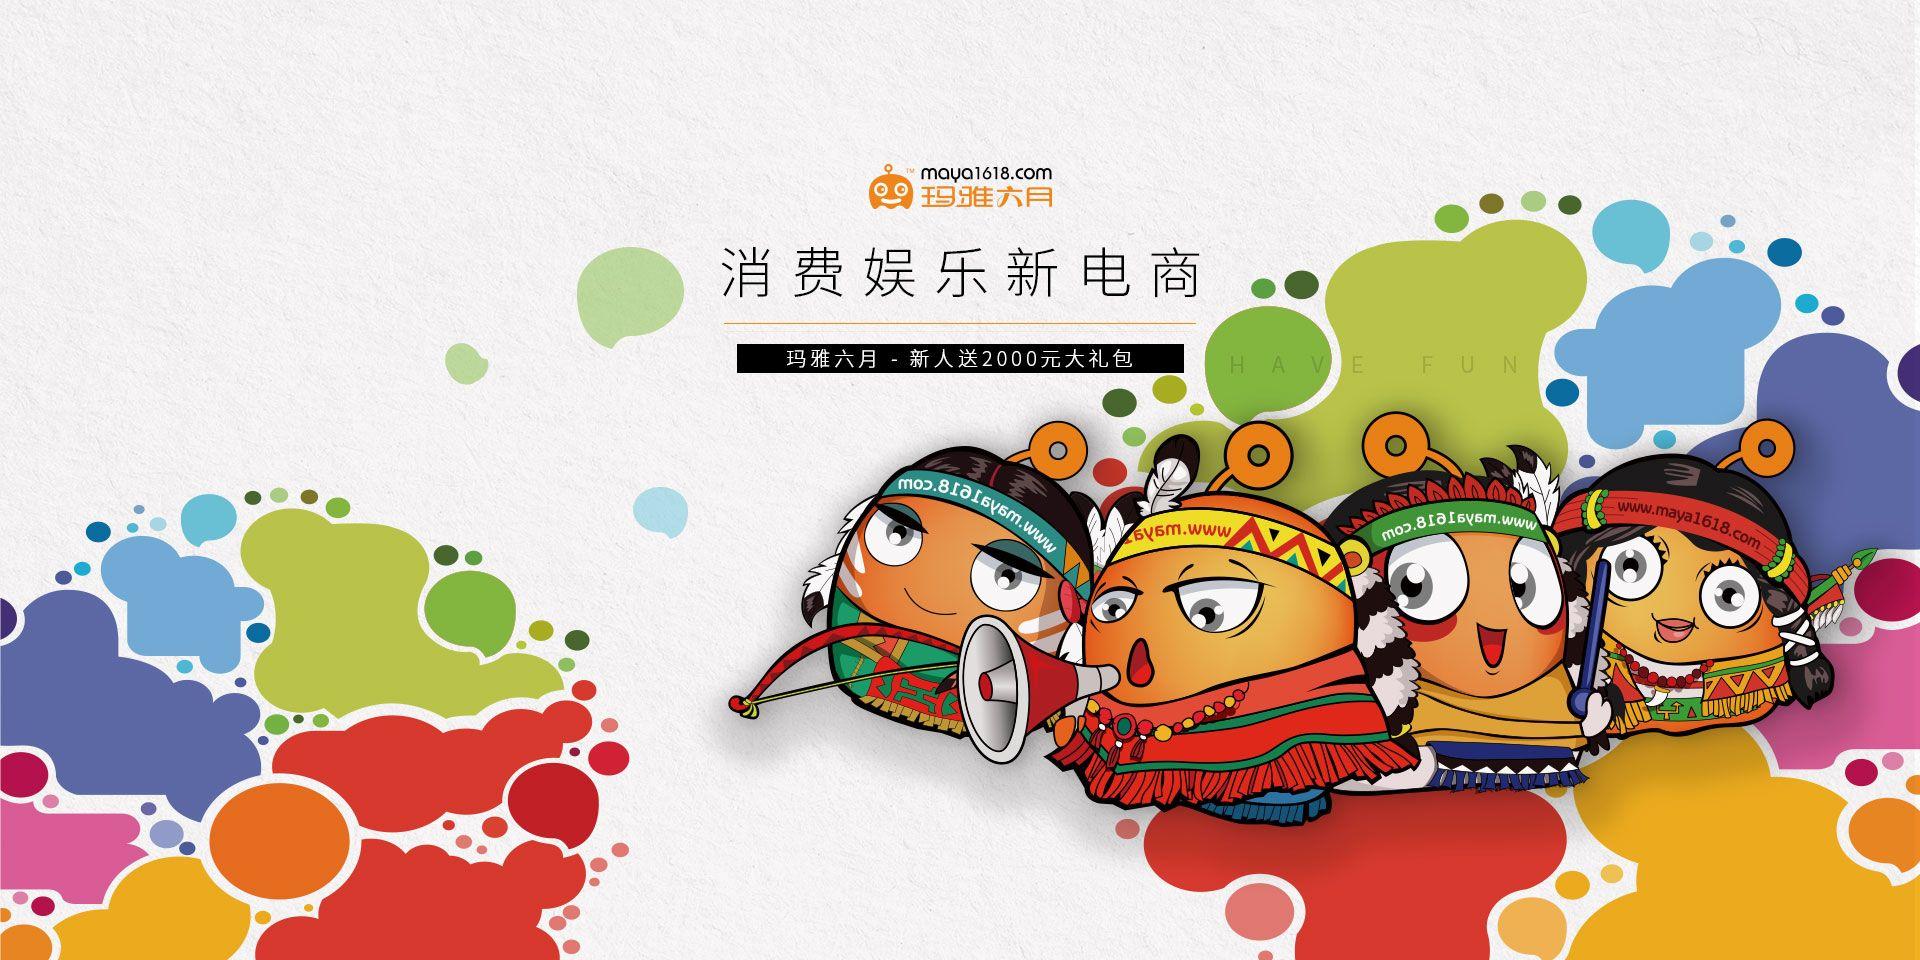 Business landscape of Tiens Group